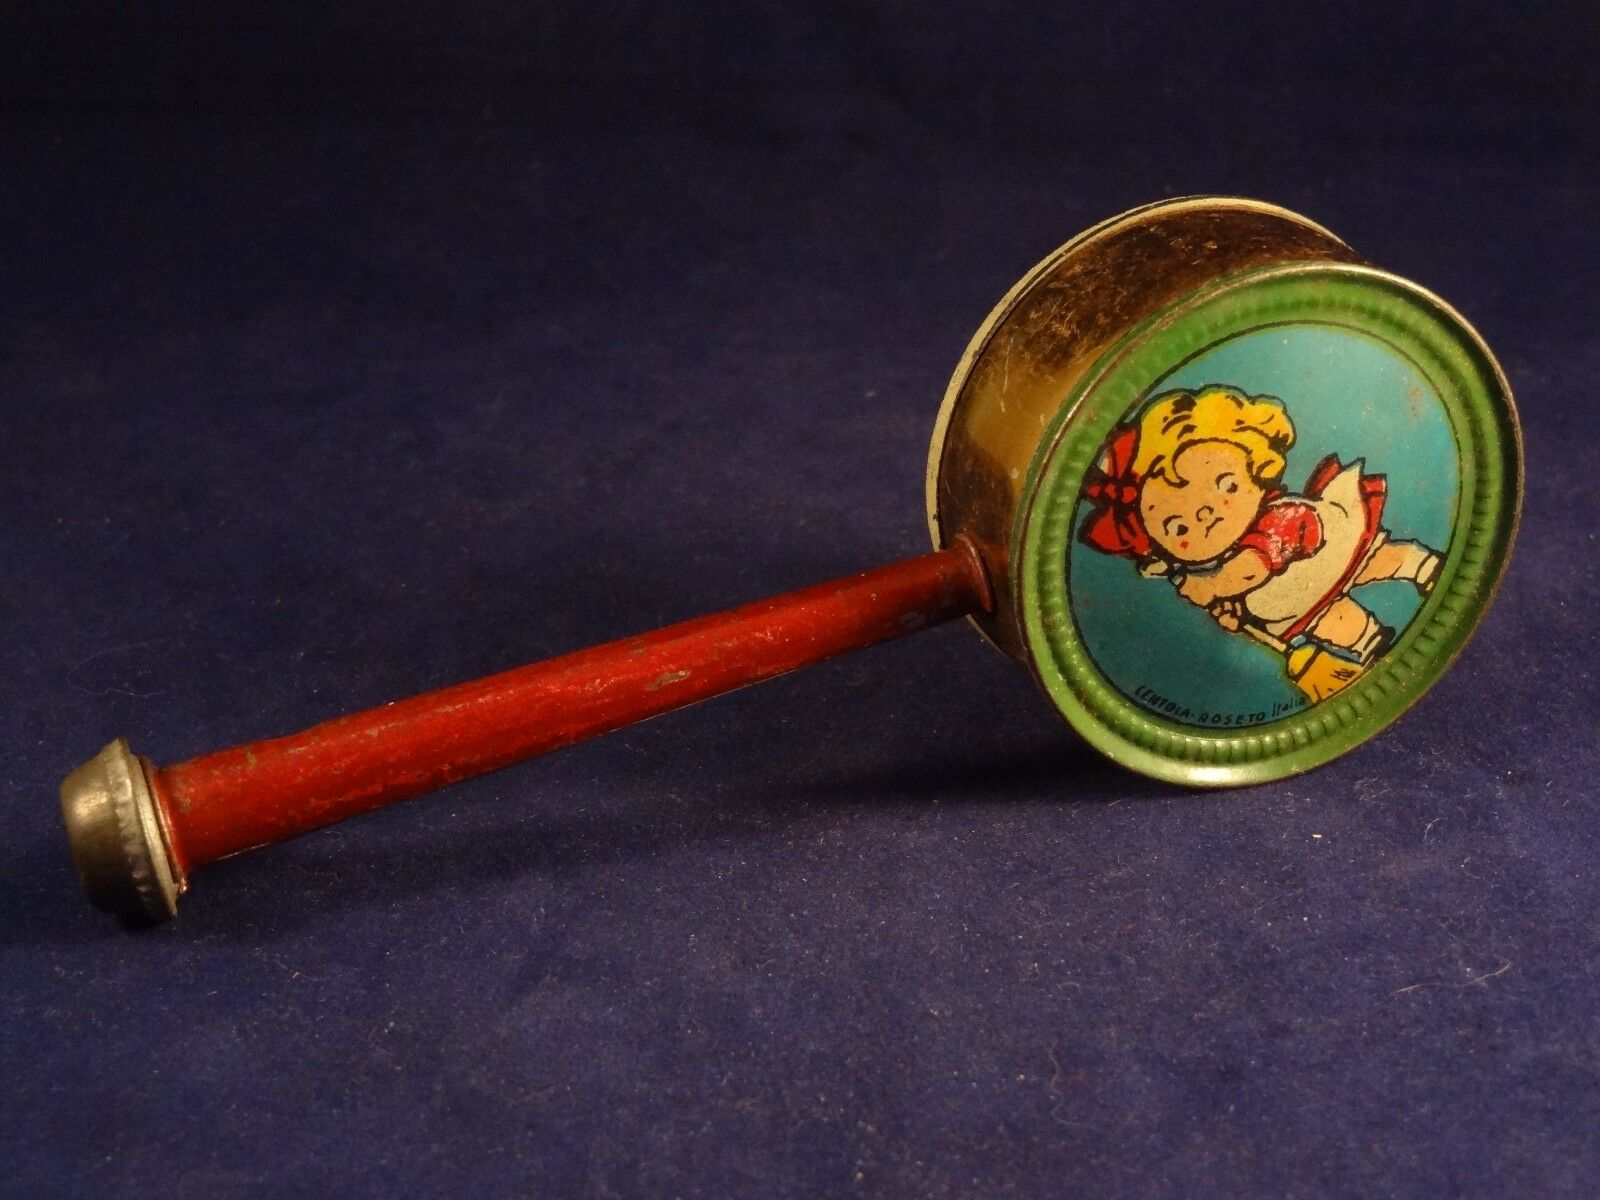 Ancien jouet hochet sifflet tôle Centola Roseto Italia caneton enfant enfant enfant 1920 543980